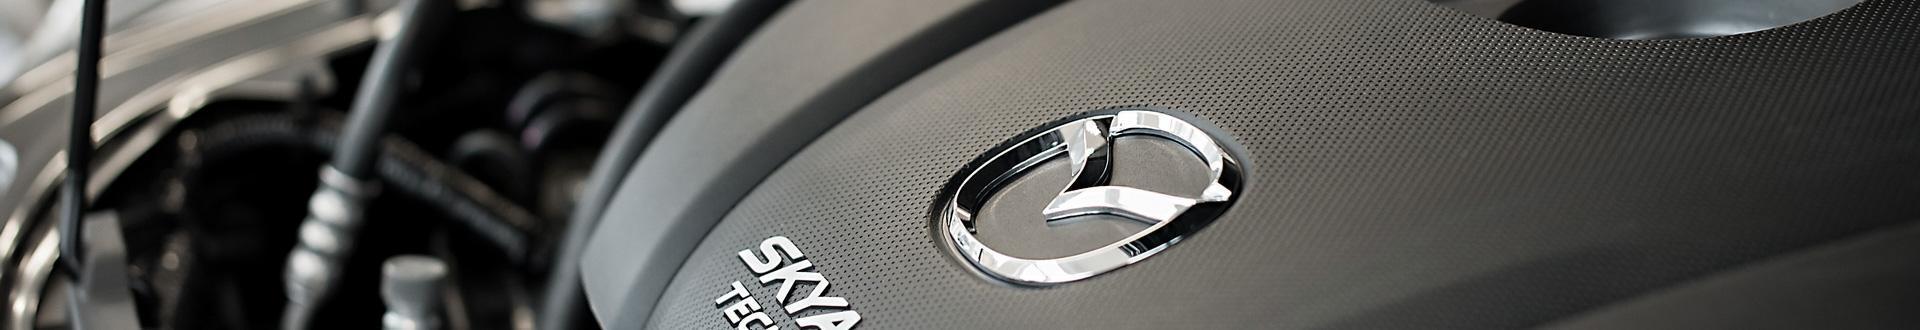 Pokrywa silnika marki Mazda